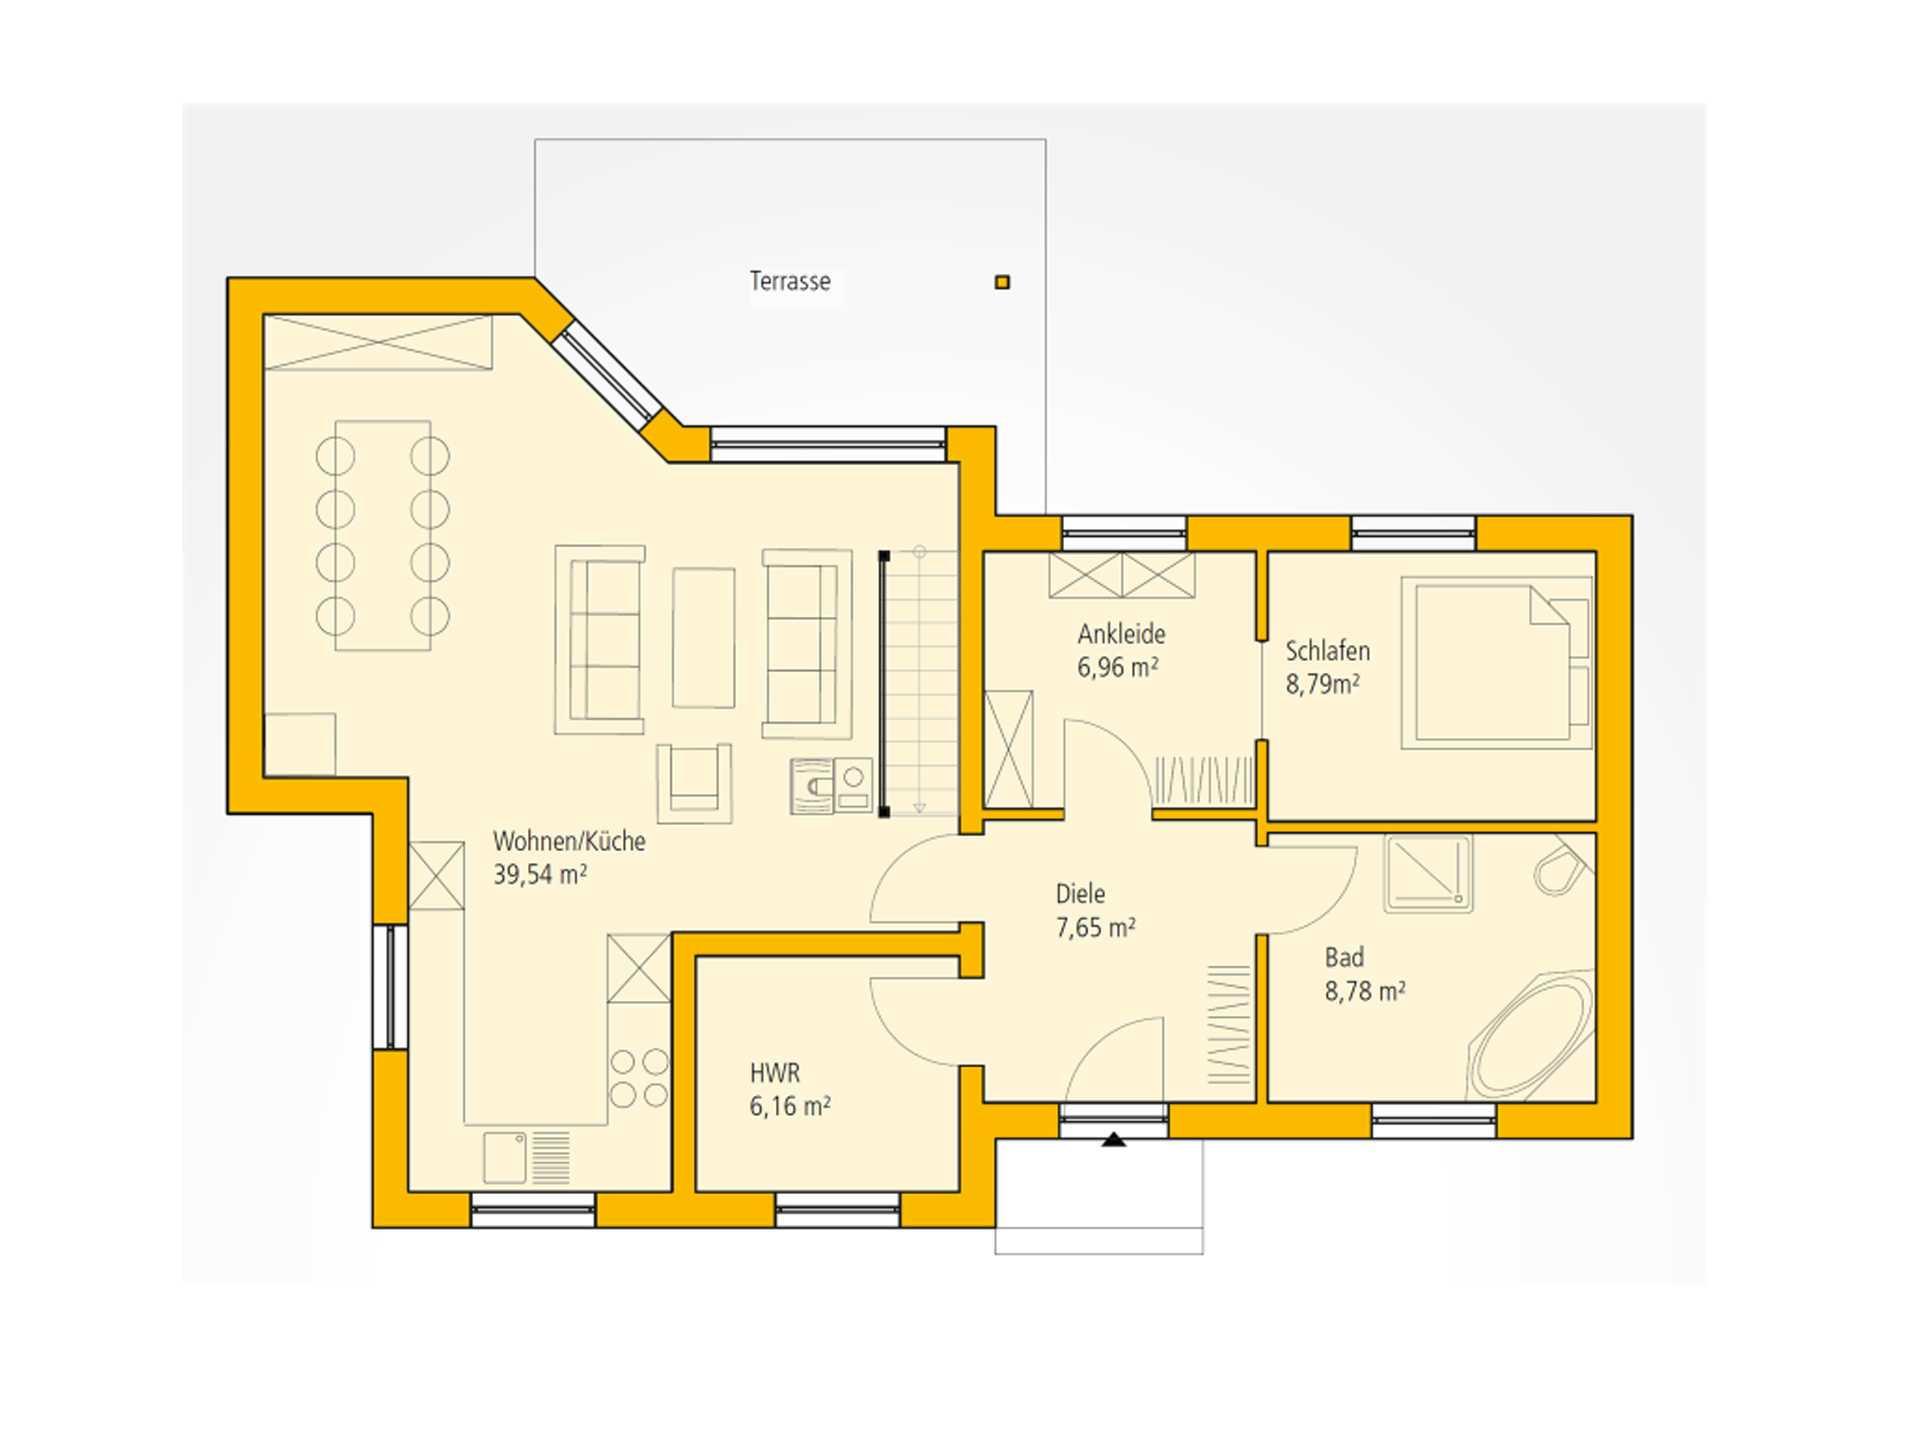 Bungalow WA 83 Grundriss EG von Ytong Bausatzhaus